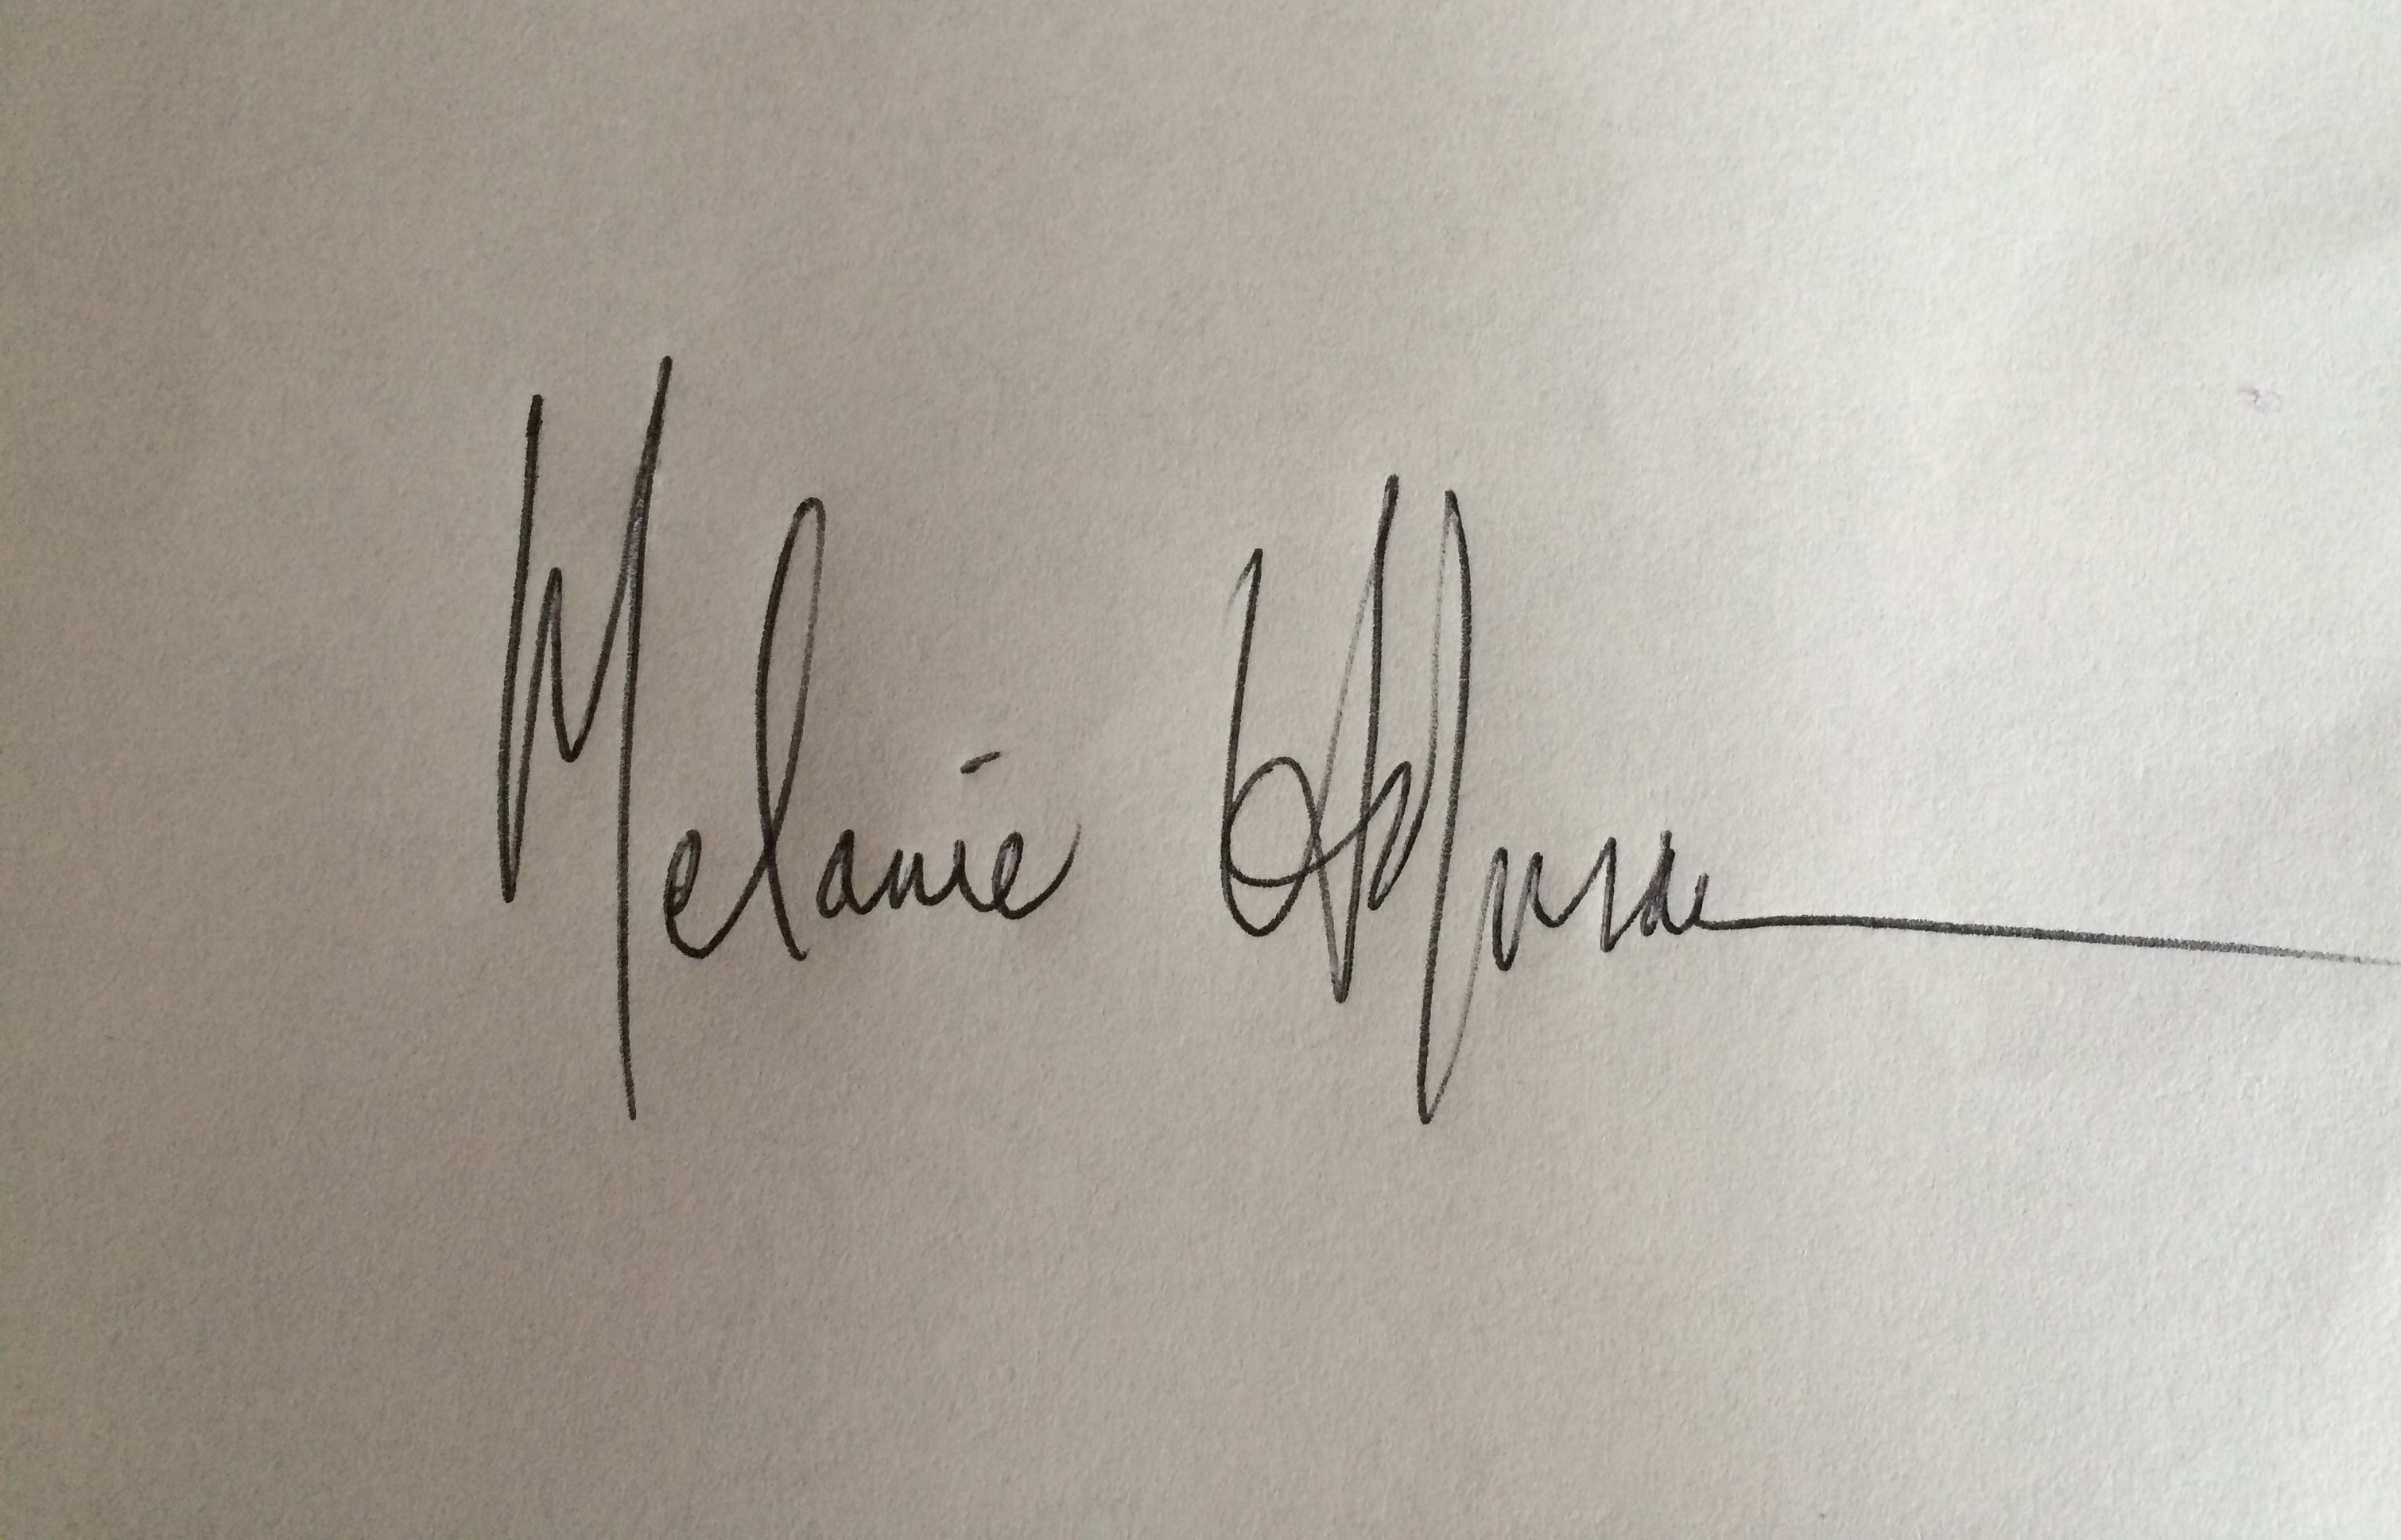 Melanie Hofmann's Signature